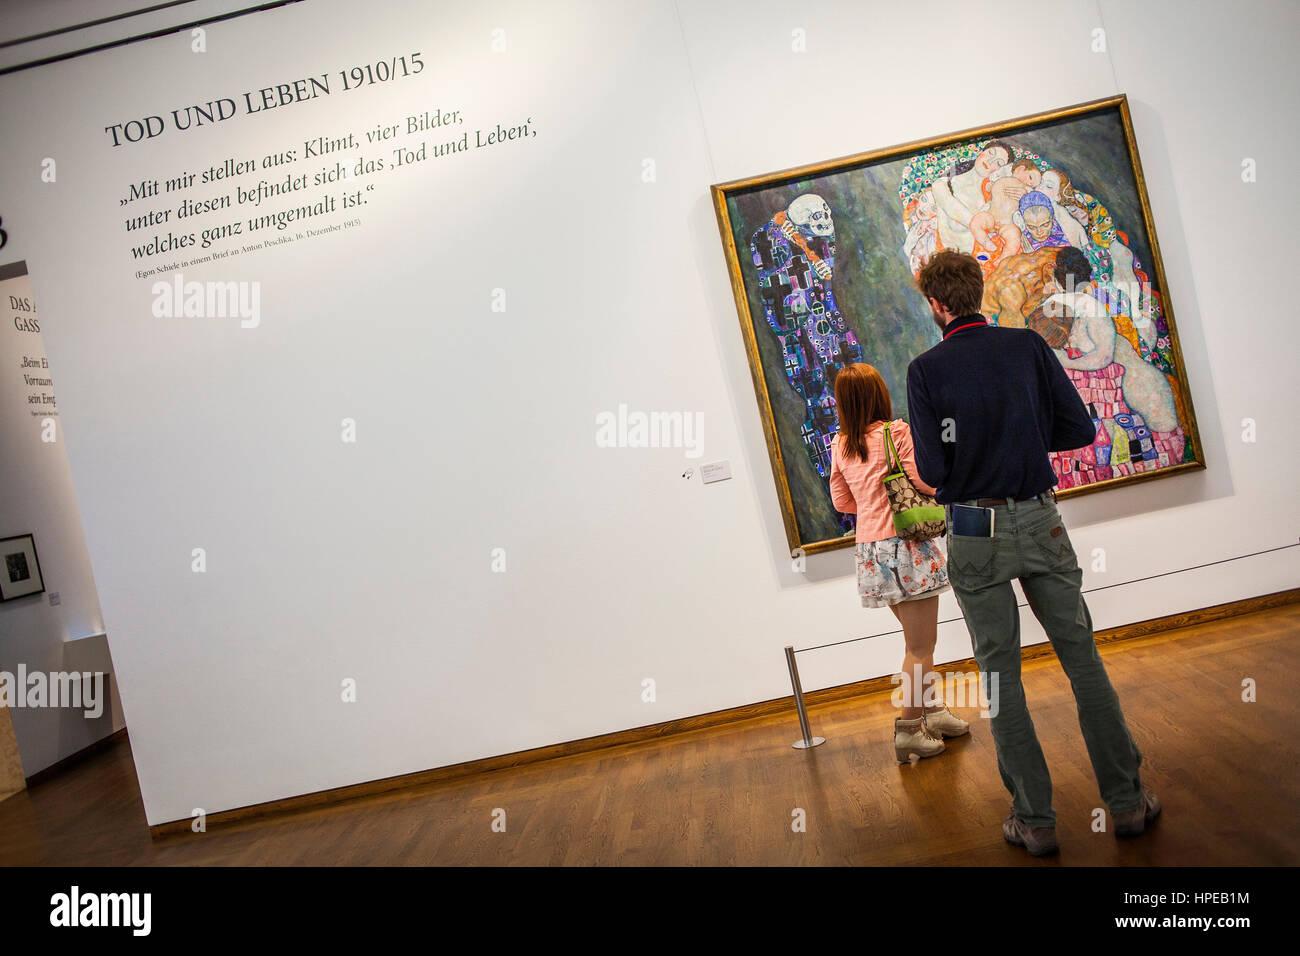 Tod und Leben,oil on canvas,Gustav Klimt,Leopold Museum,Vienna, Austria, Europe - Stock Image